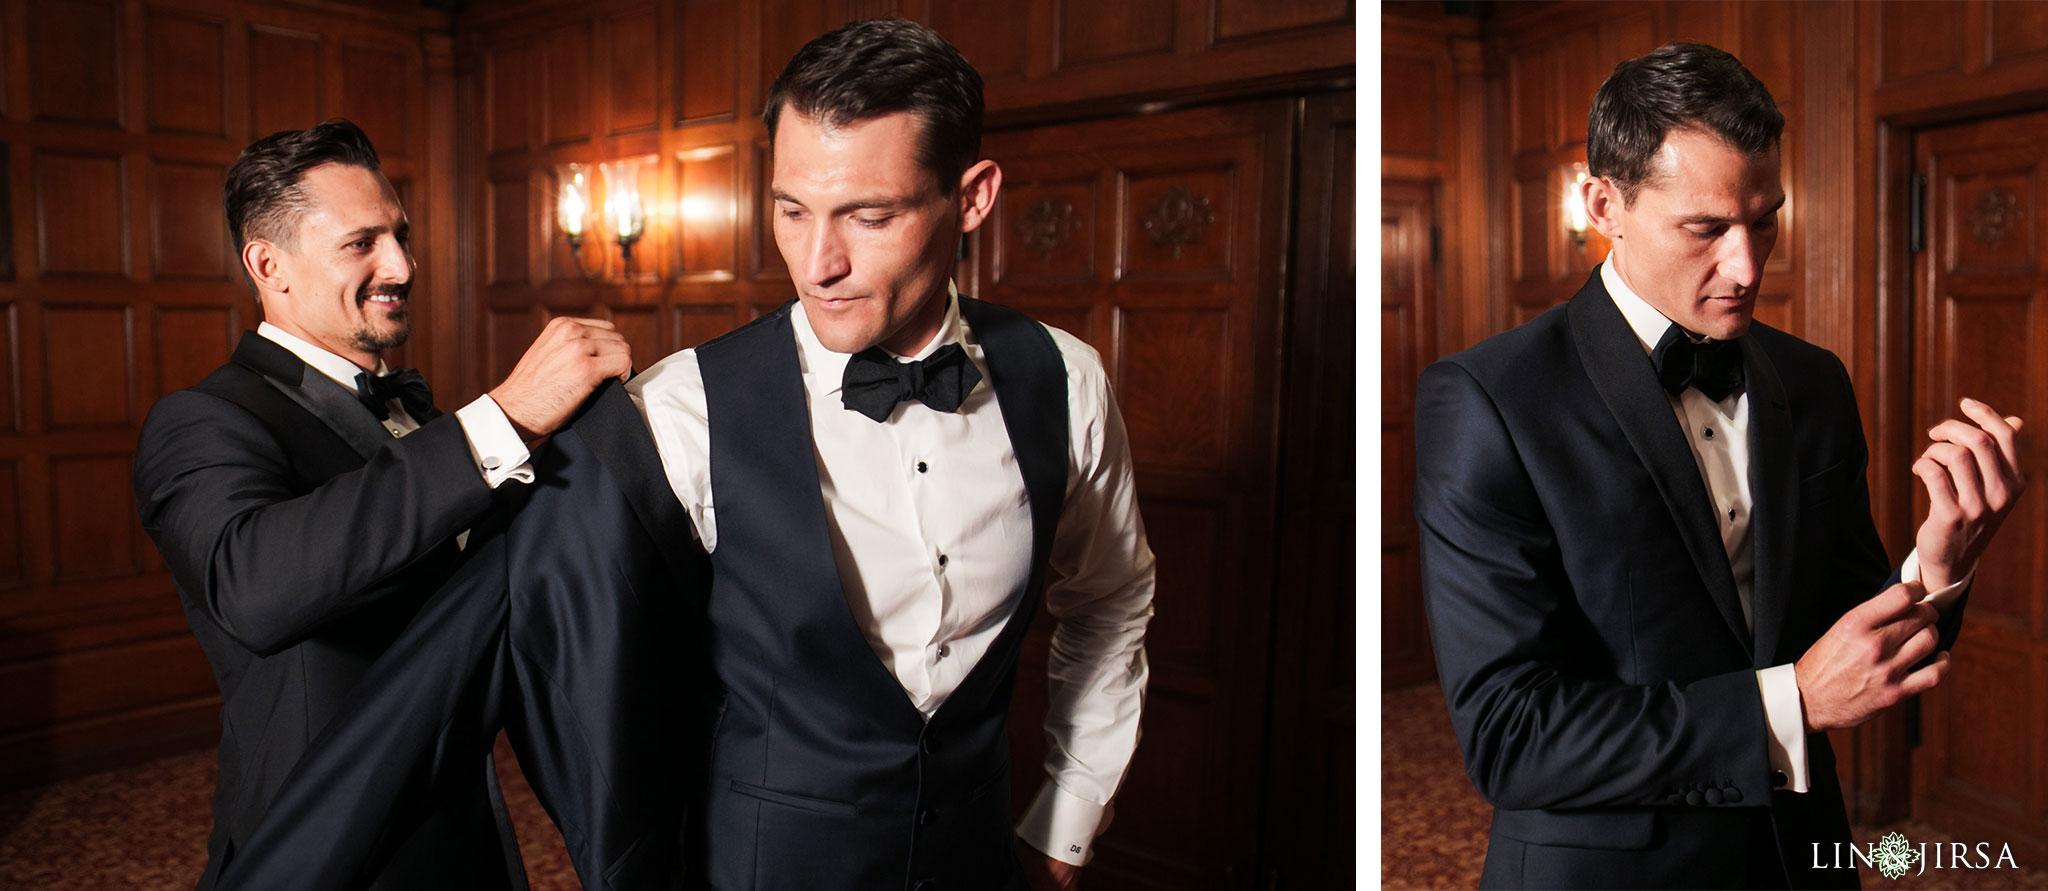 007 millennium biltmore hotel los angeles wedding photography